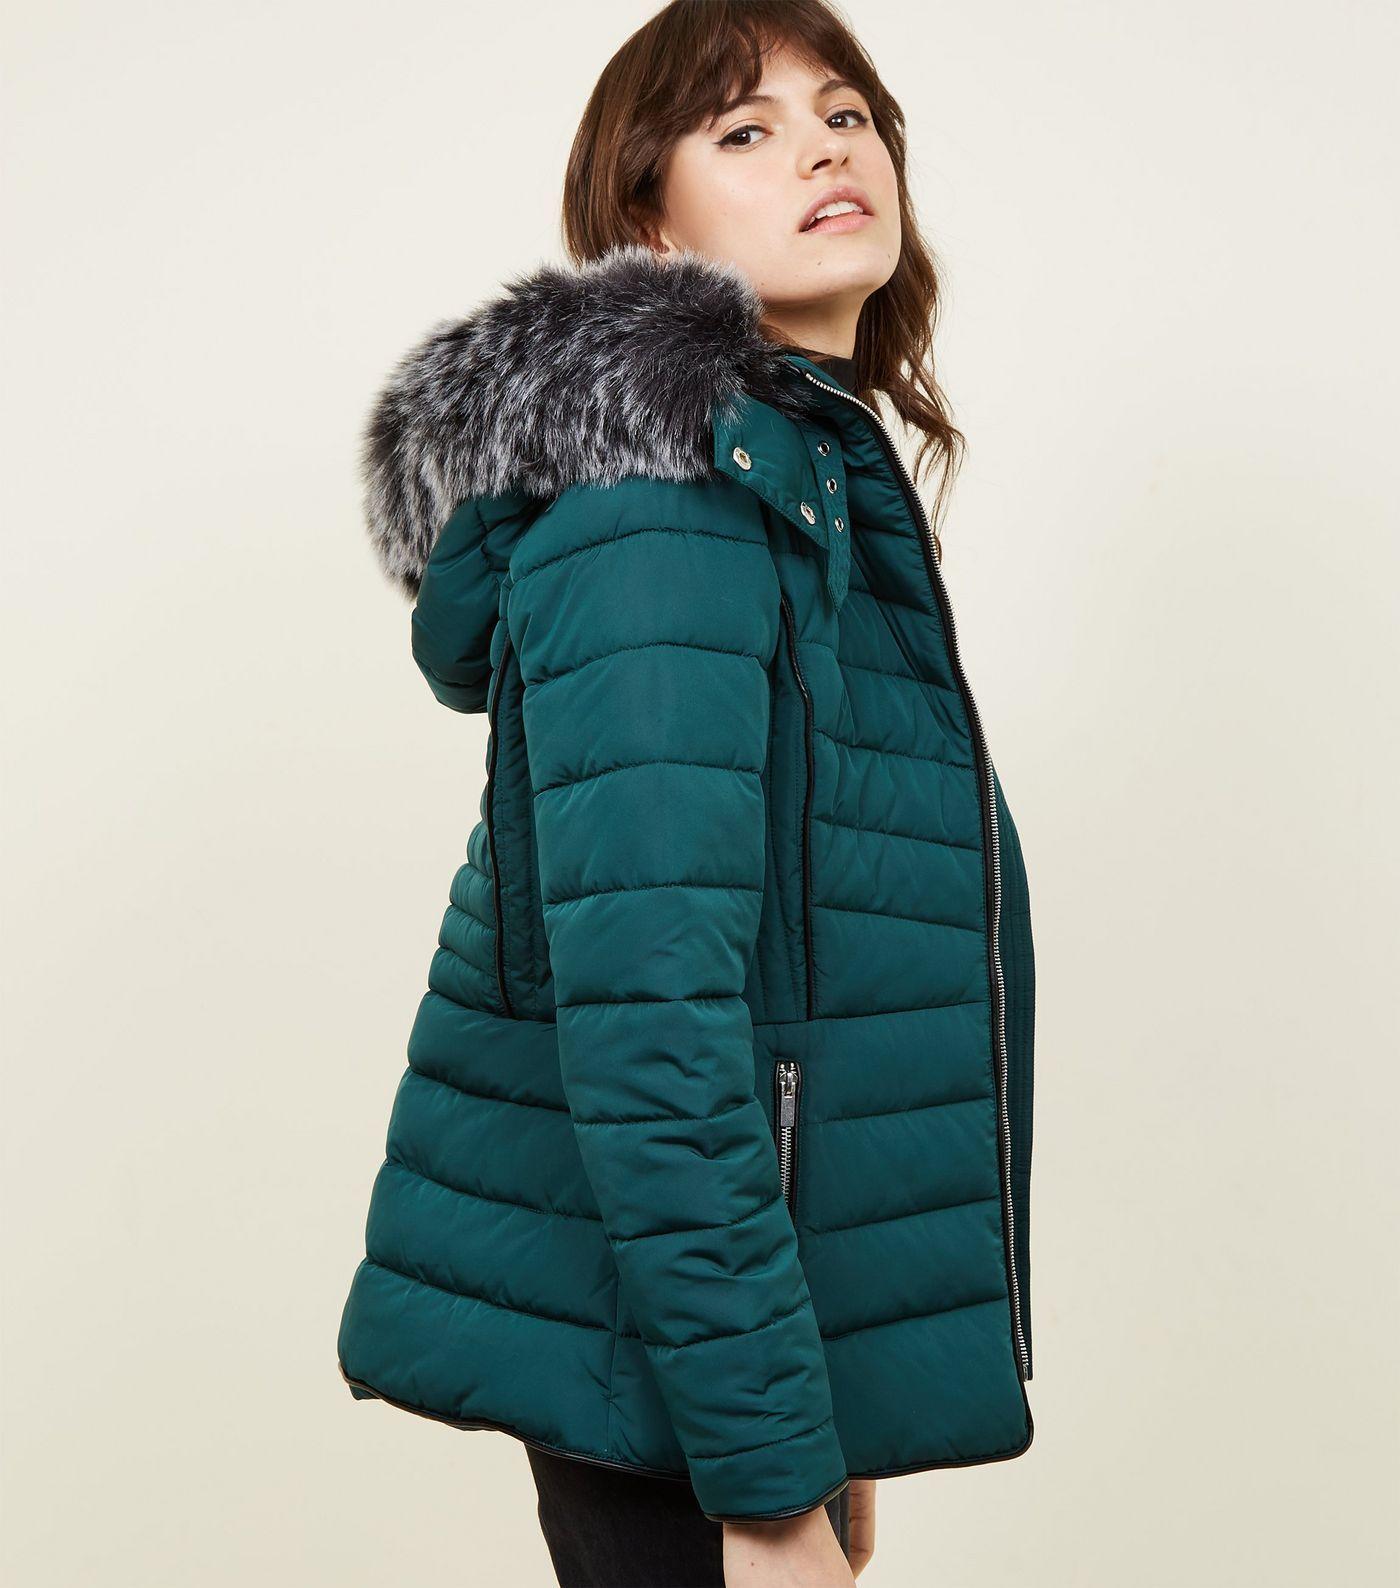 Black Faux Fur Trim Hooded Puffer Jacket Coats jackets